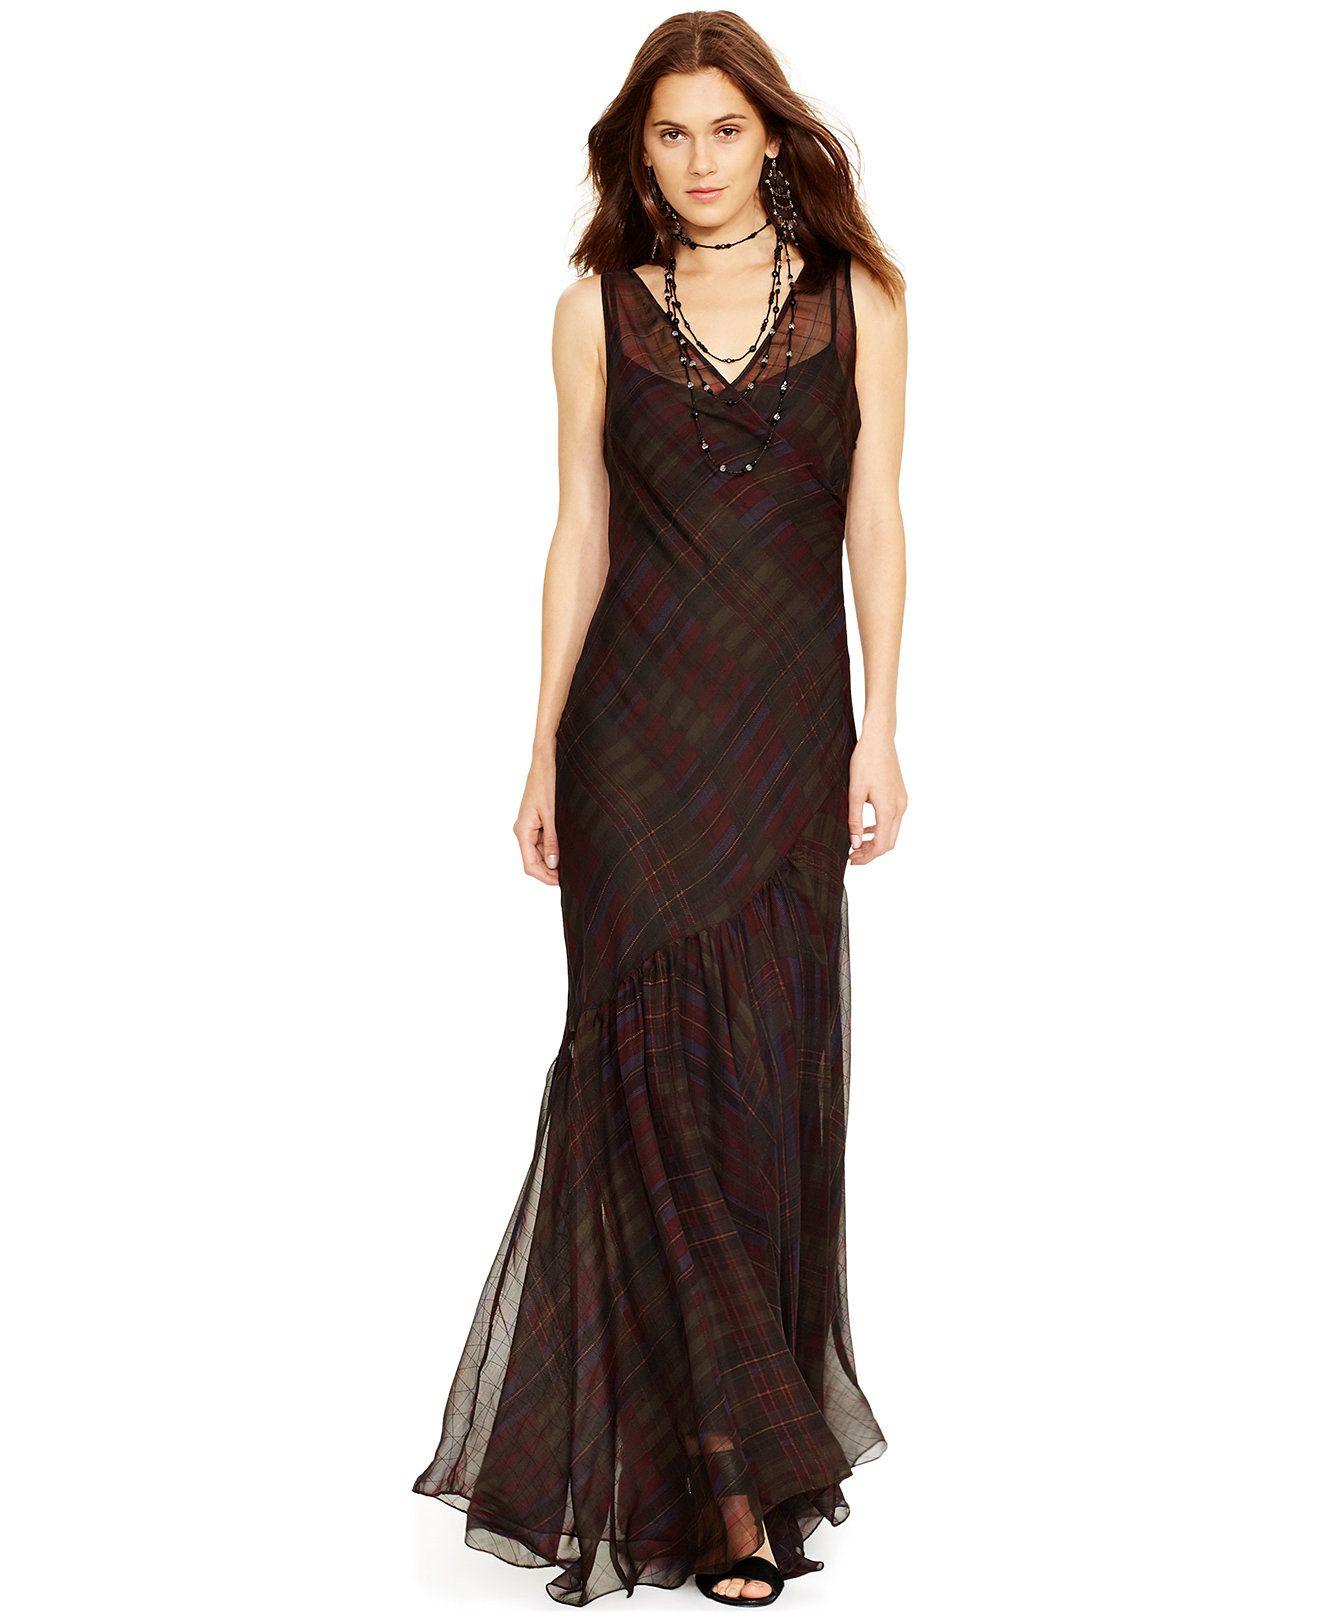 Polo Ralph Lauren Silk Plaid Maxi Dress - Dresses - Women - Macy s ... f9ac0737a